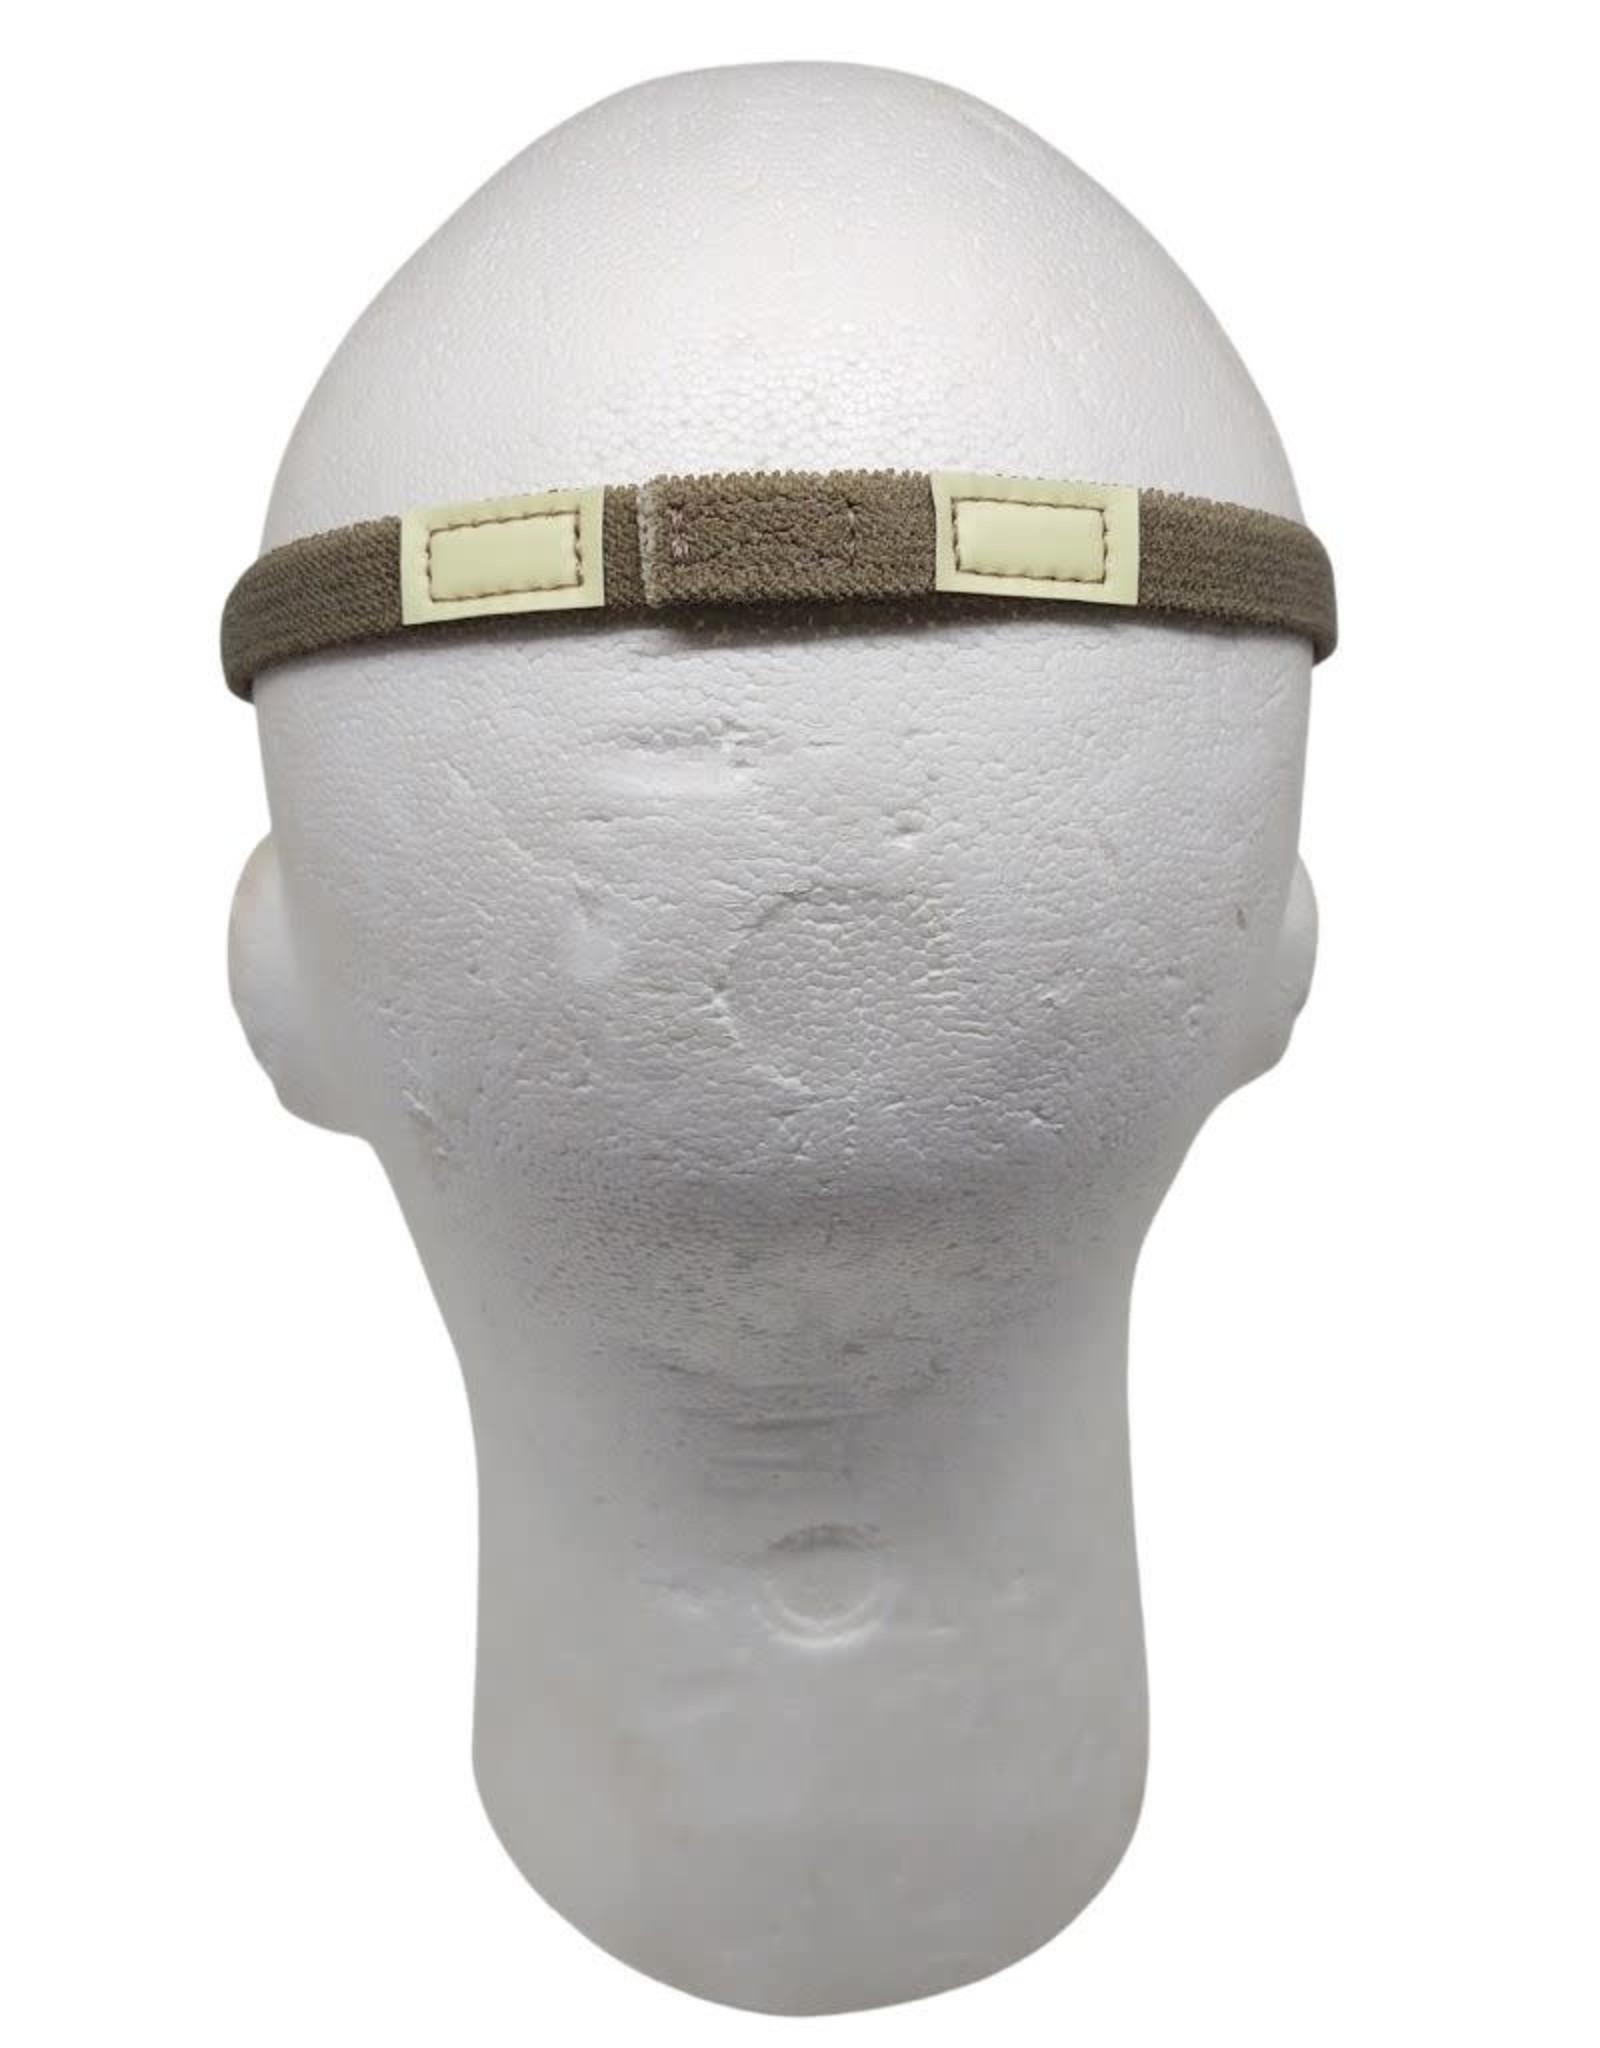 Headband Helmet Band w/ Cat Eyes - OCP Scorpion